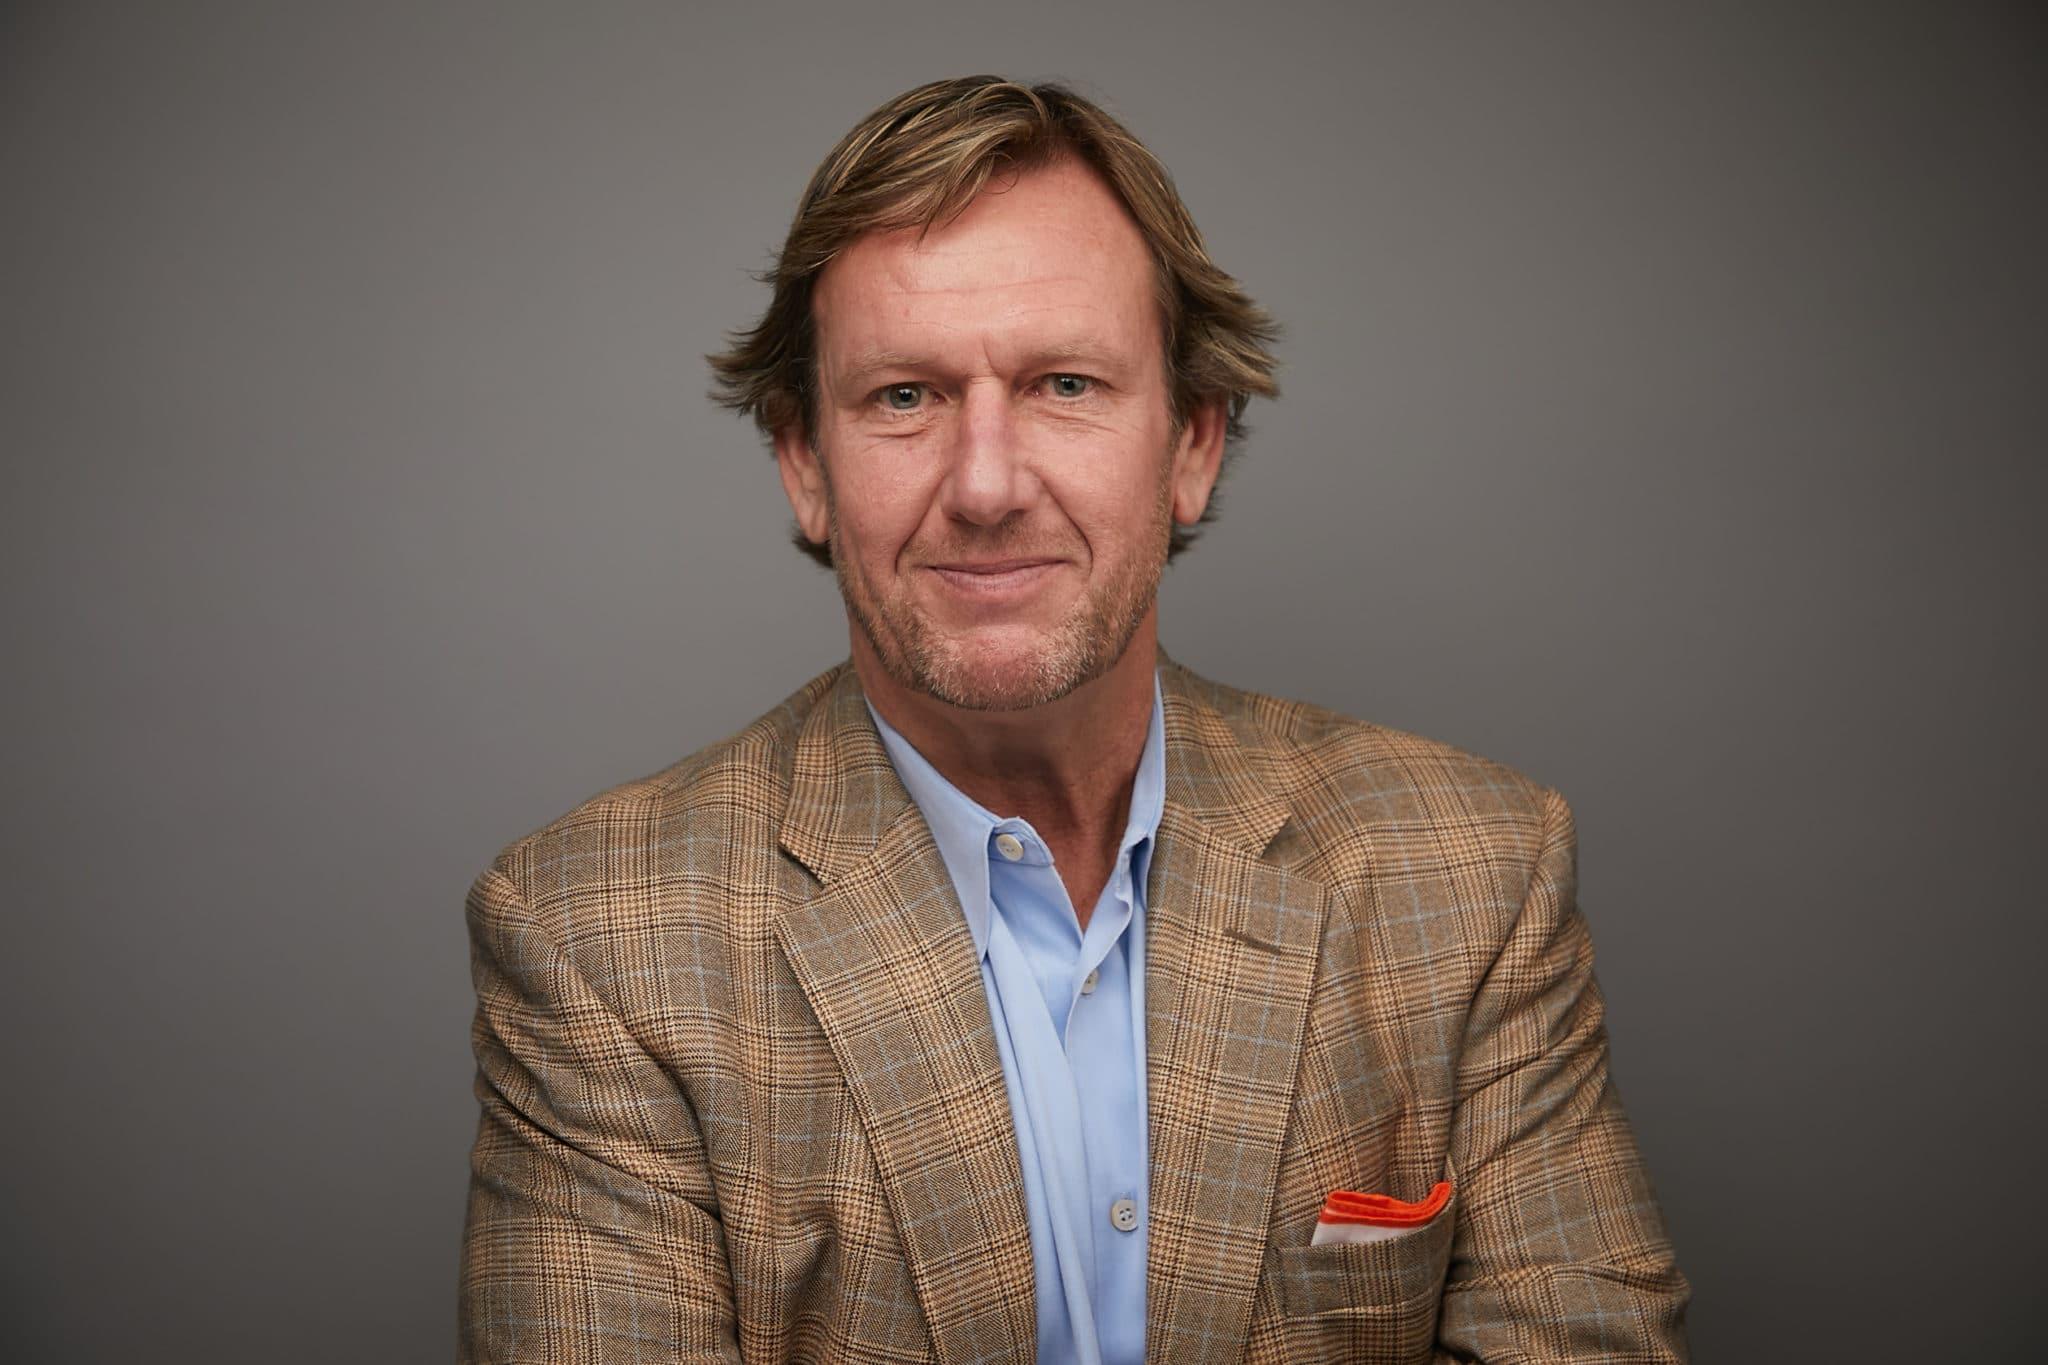 David Costenbader of The Contact Group